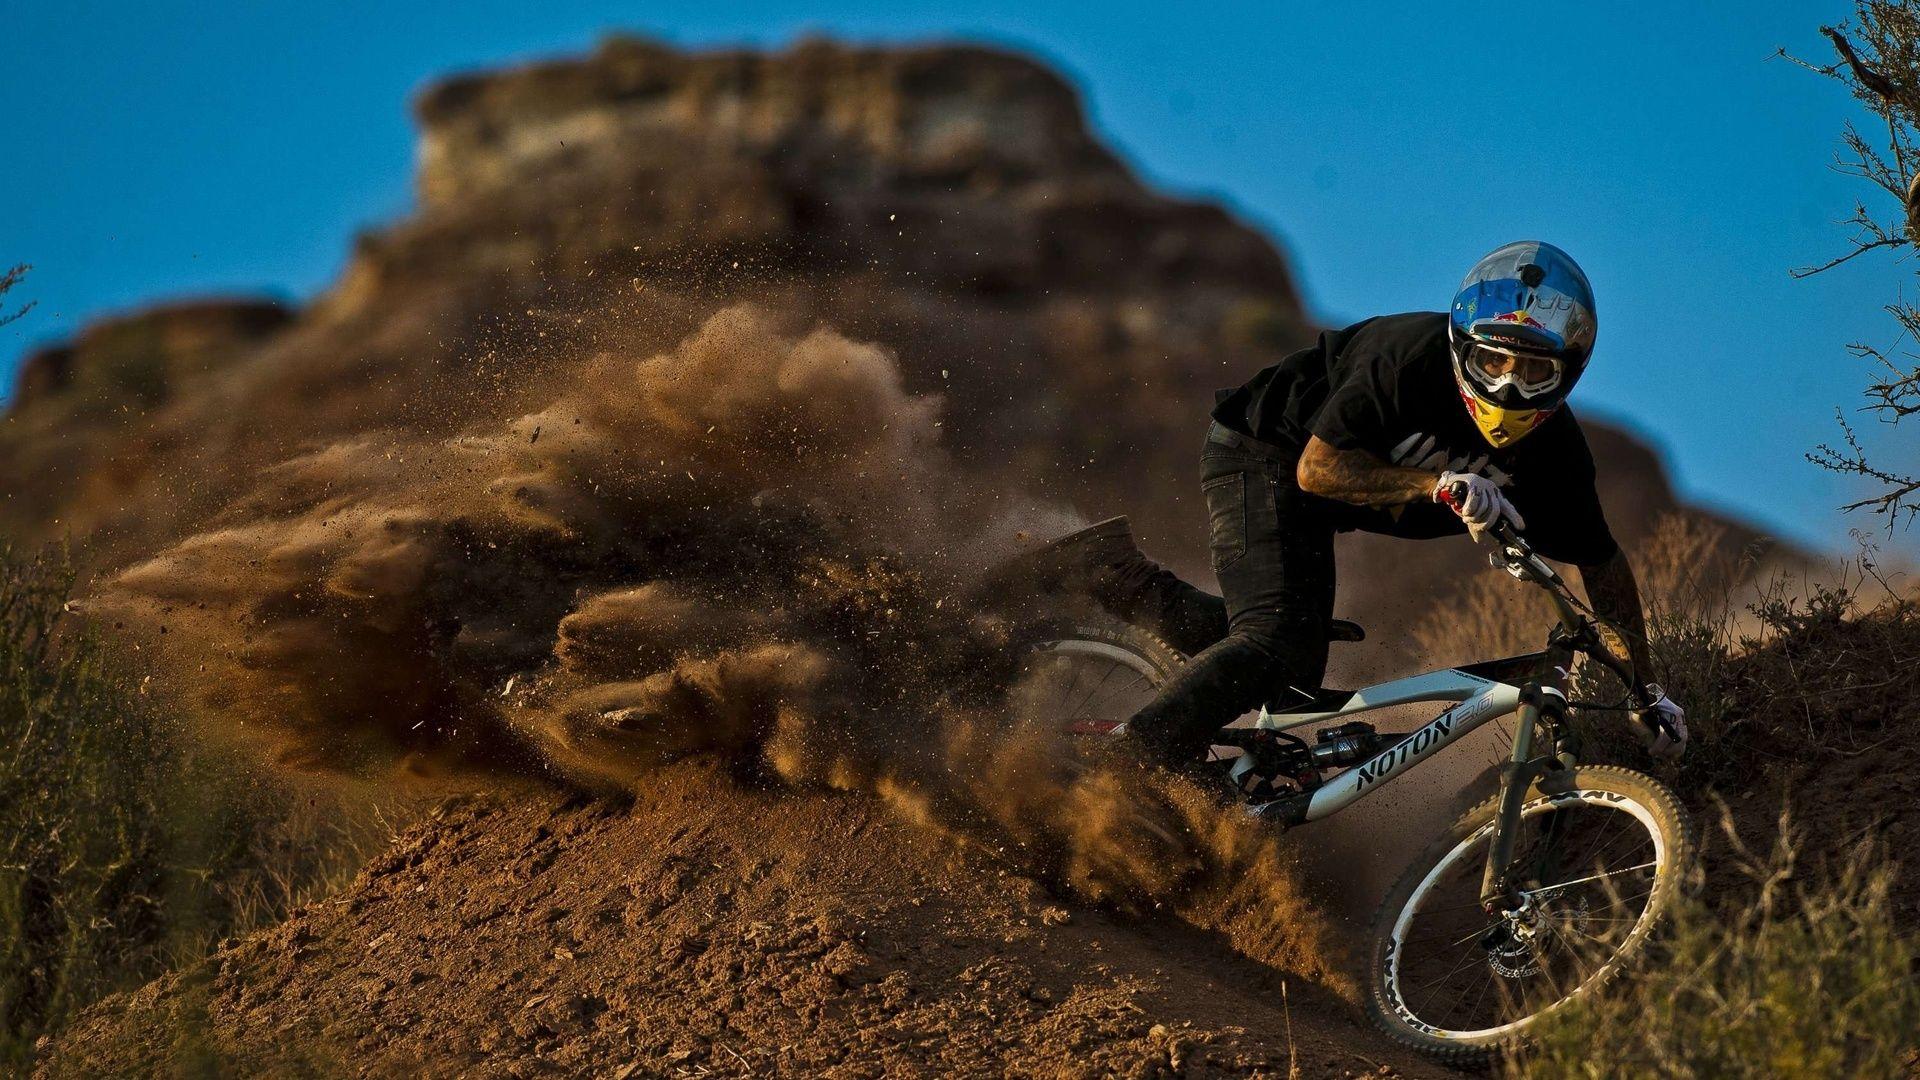 Mountain Bike Image